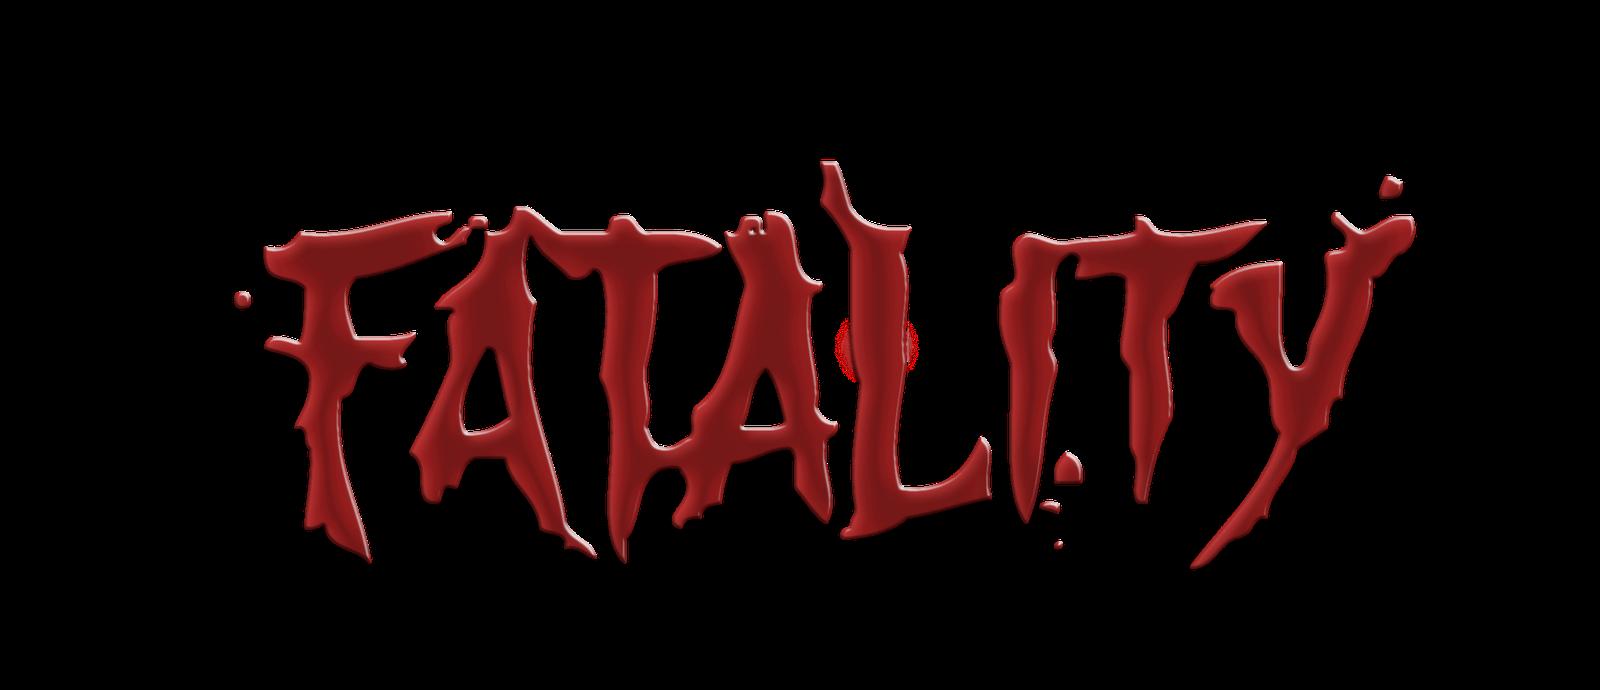 mk1 fatalities fatality johnny cage fatality frente frente frente hpMortal Kombat Scorpion Fatality Gif